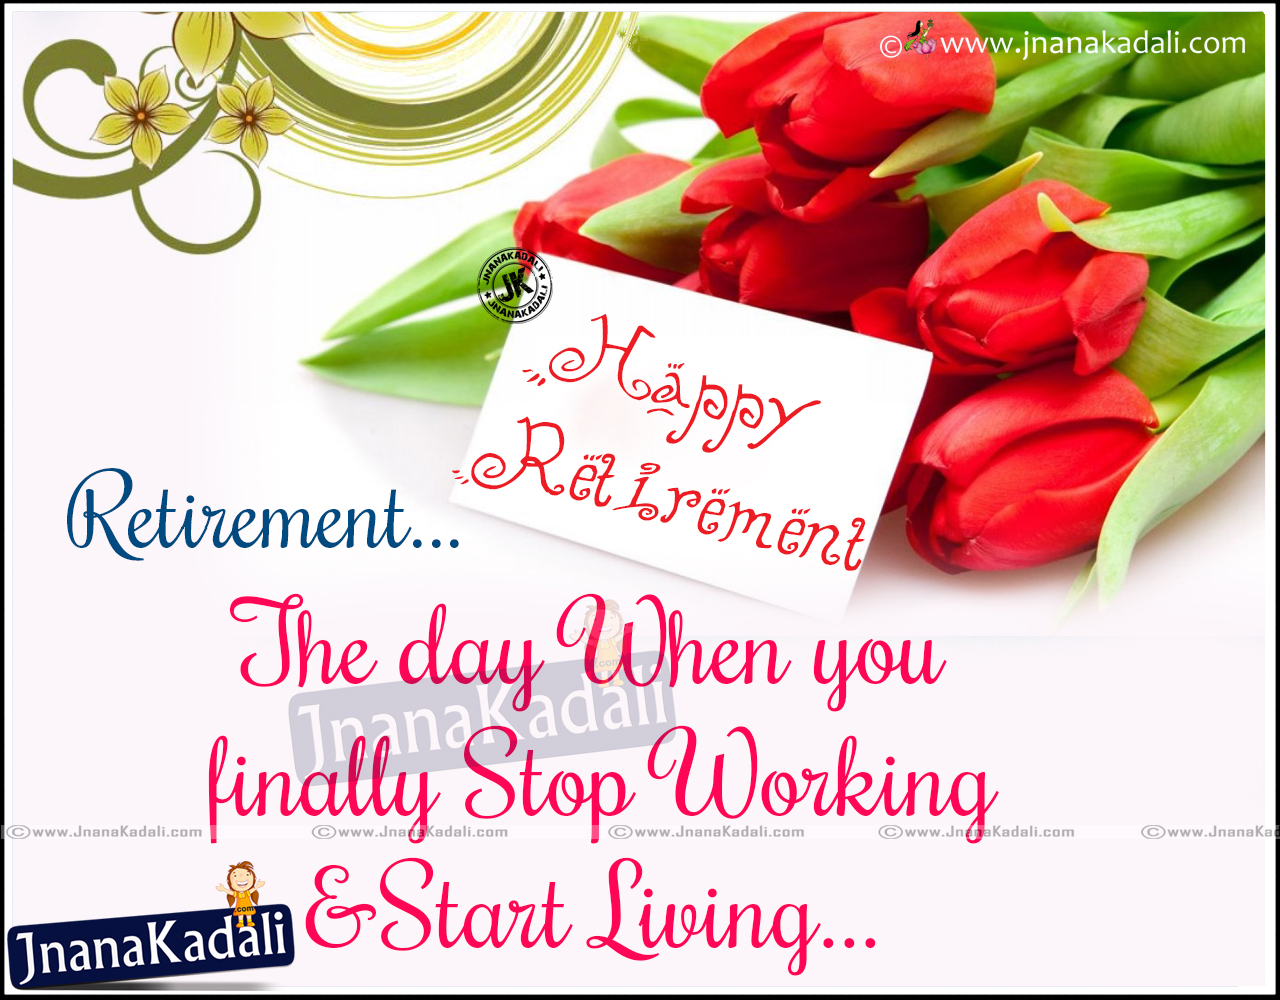 Happy retirement telugu quotes greetings wishes sms jnana kadali english best happy retirement quotes and greetings online happy retirement messages in englishenglish m4hsunfo